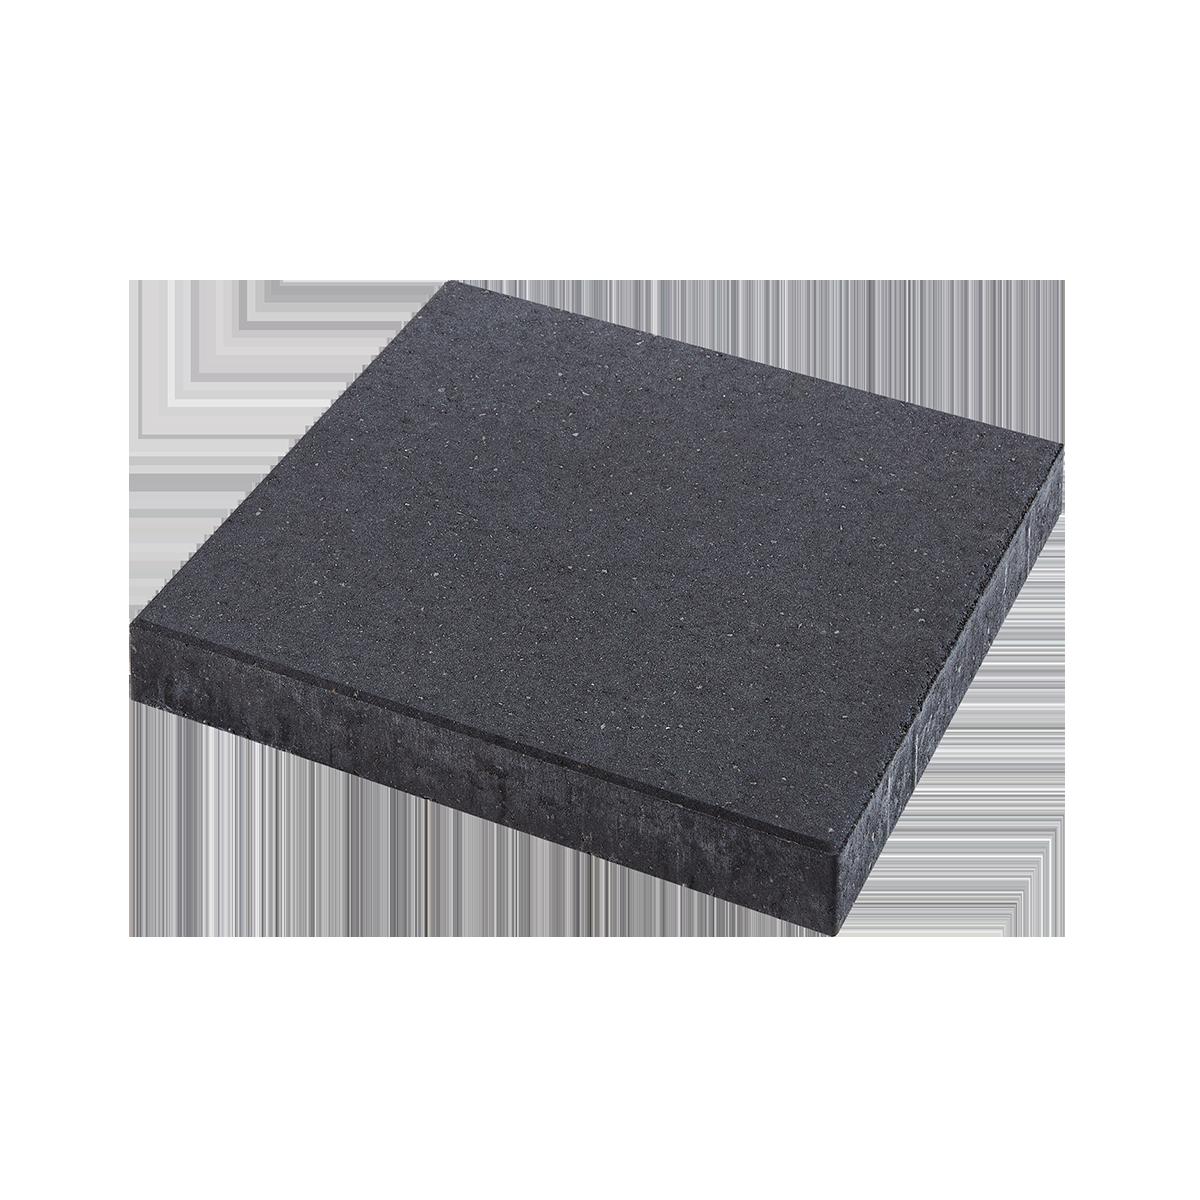 Fliser Modul 50 sort/antracit